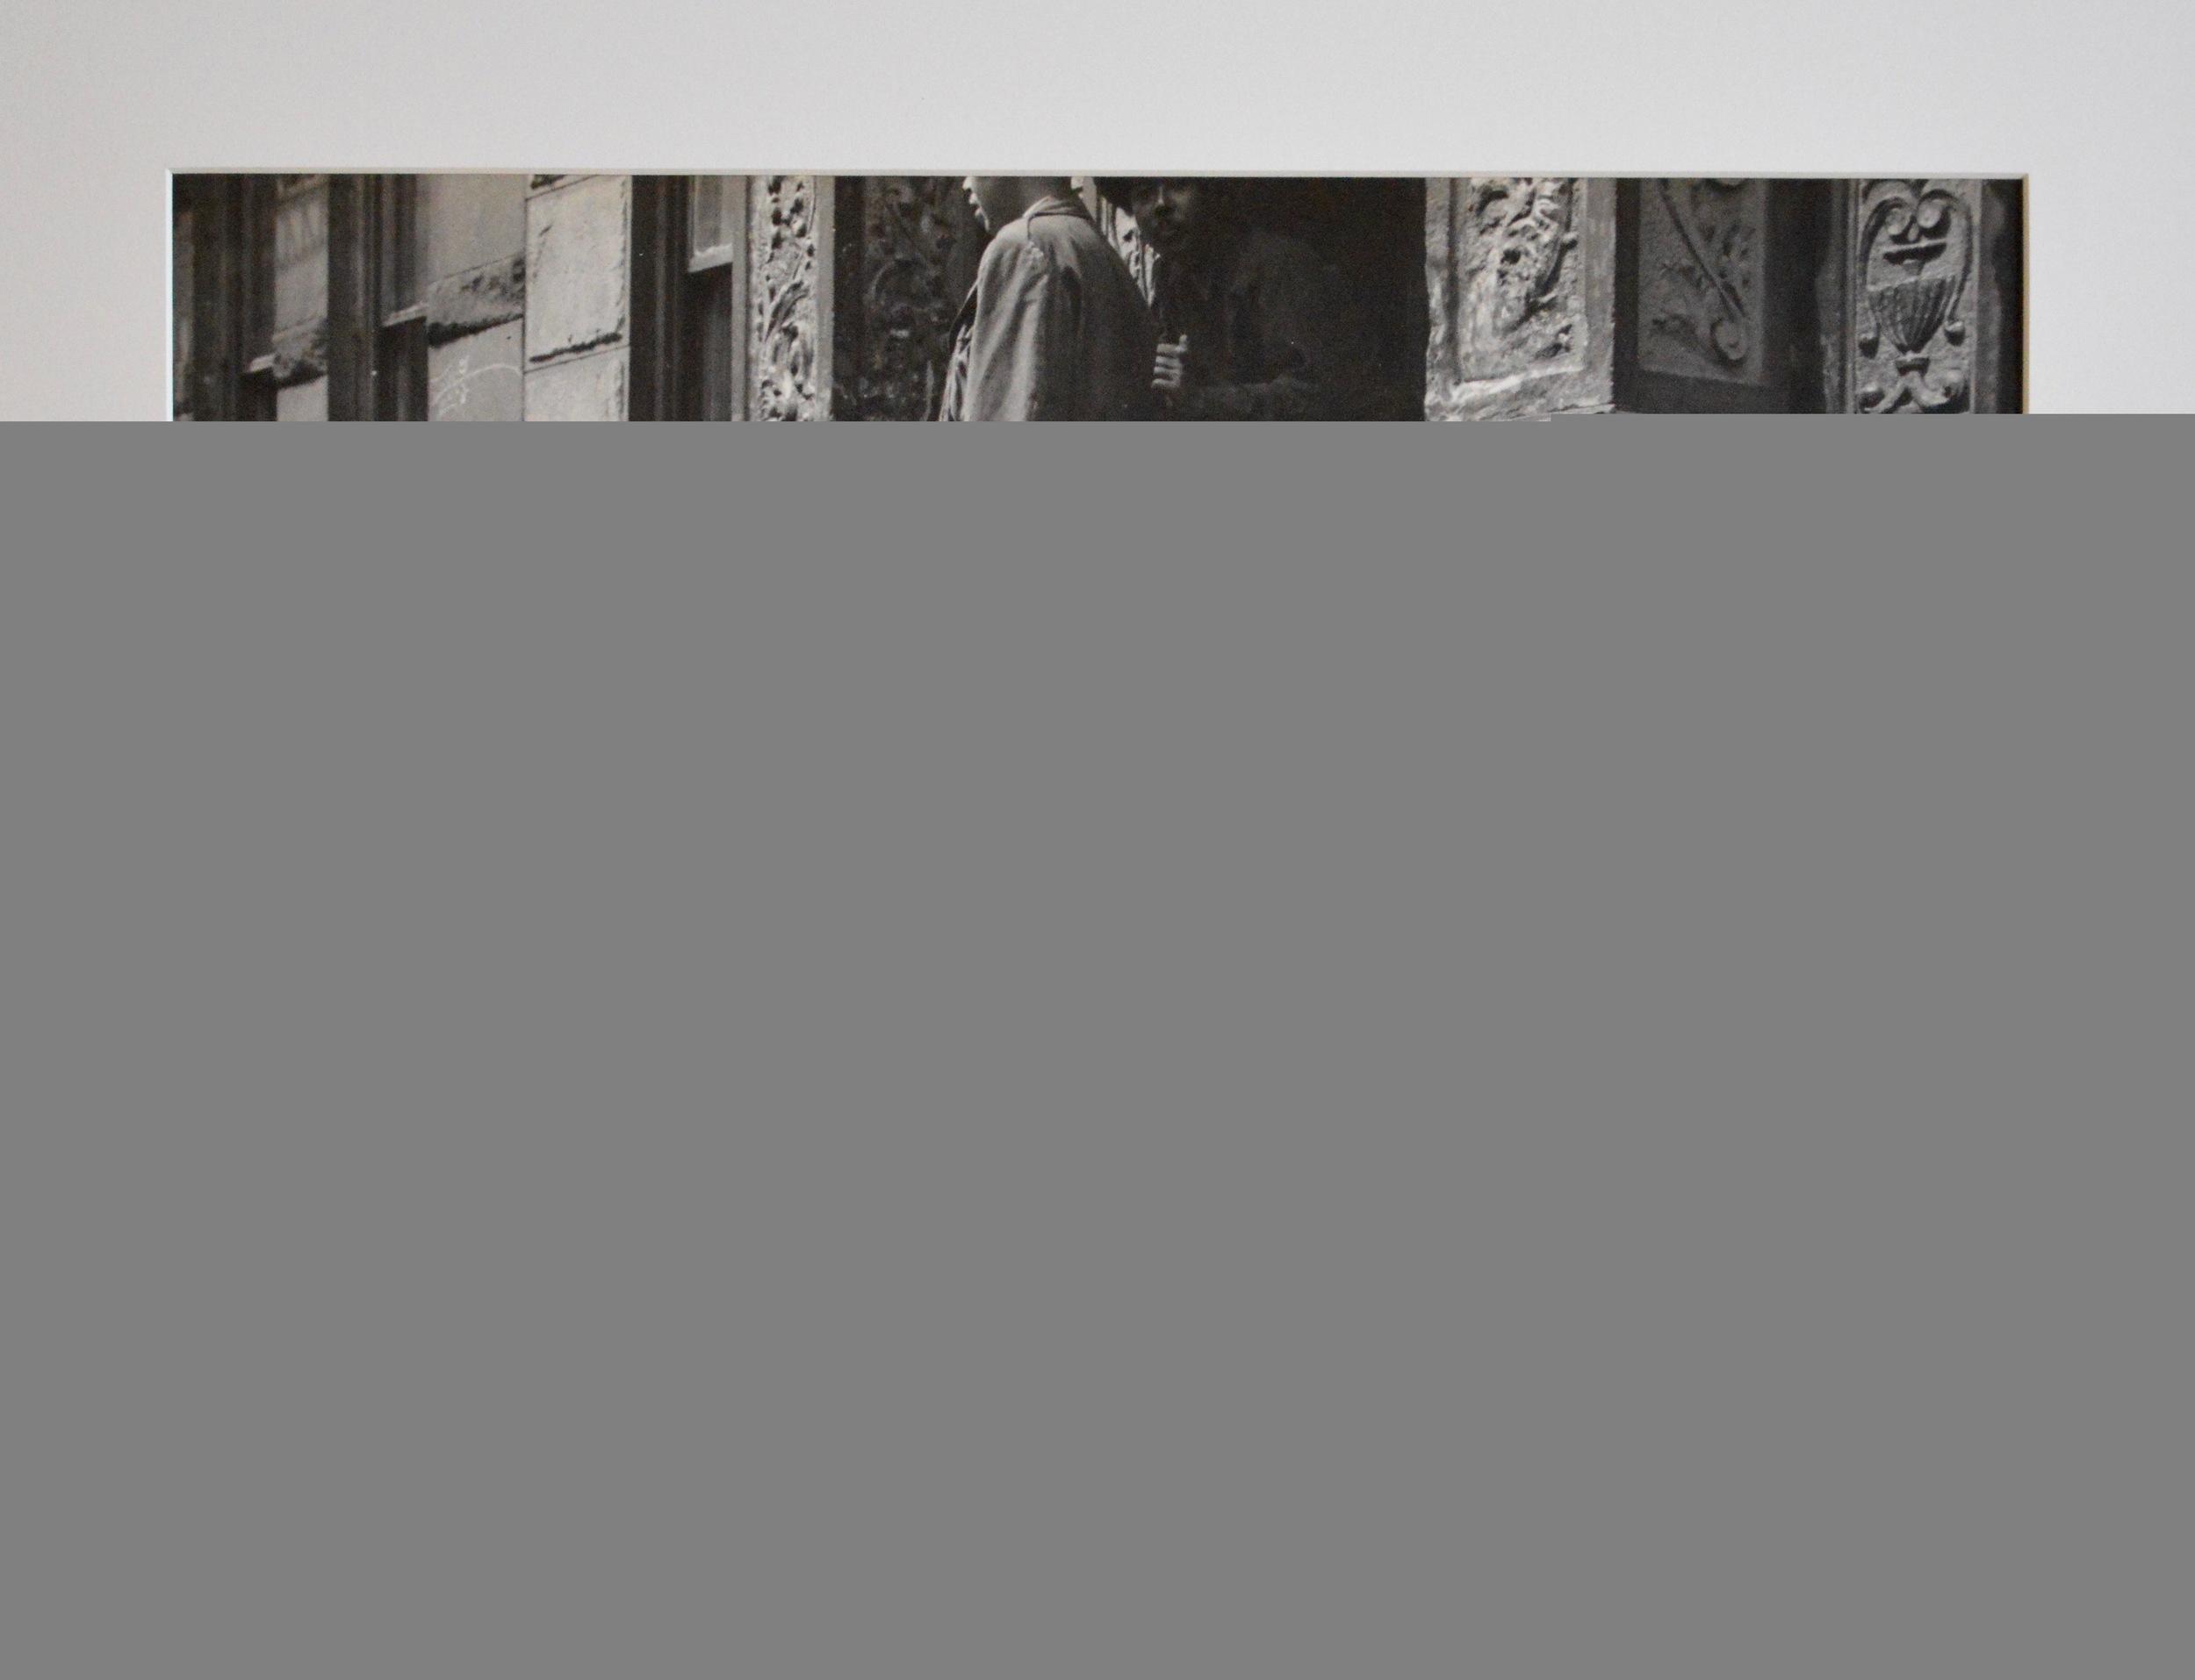 Roy DeCarava, International, 1960, 14 x 19 7_8 in